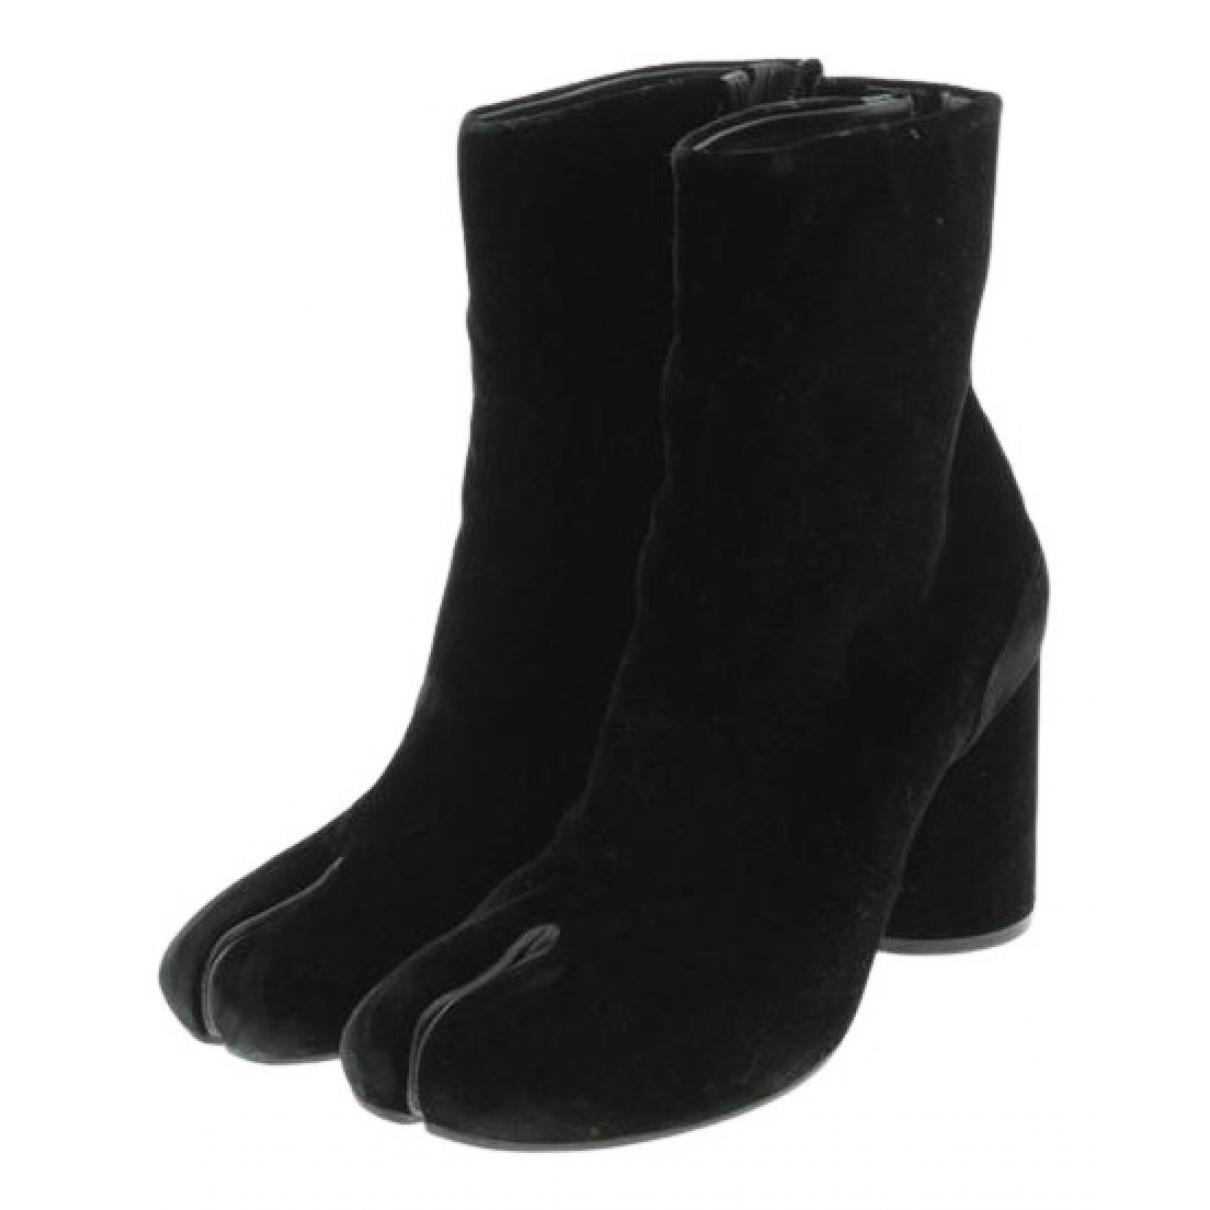 Maison Martin Margiela Tabi Black Leather Ankle boots for Women 37.5 EU